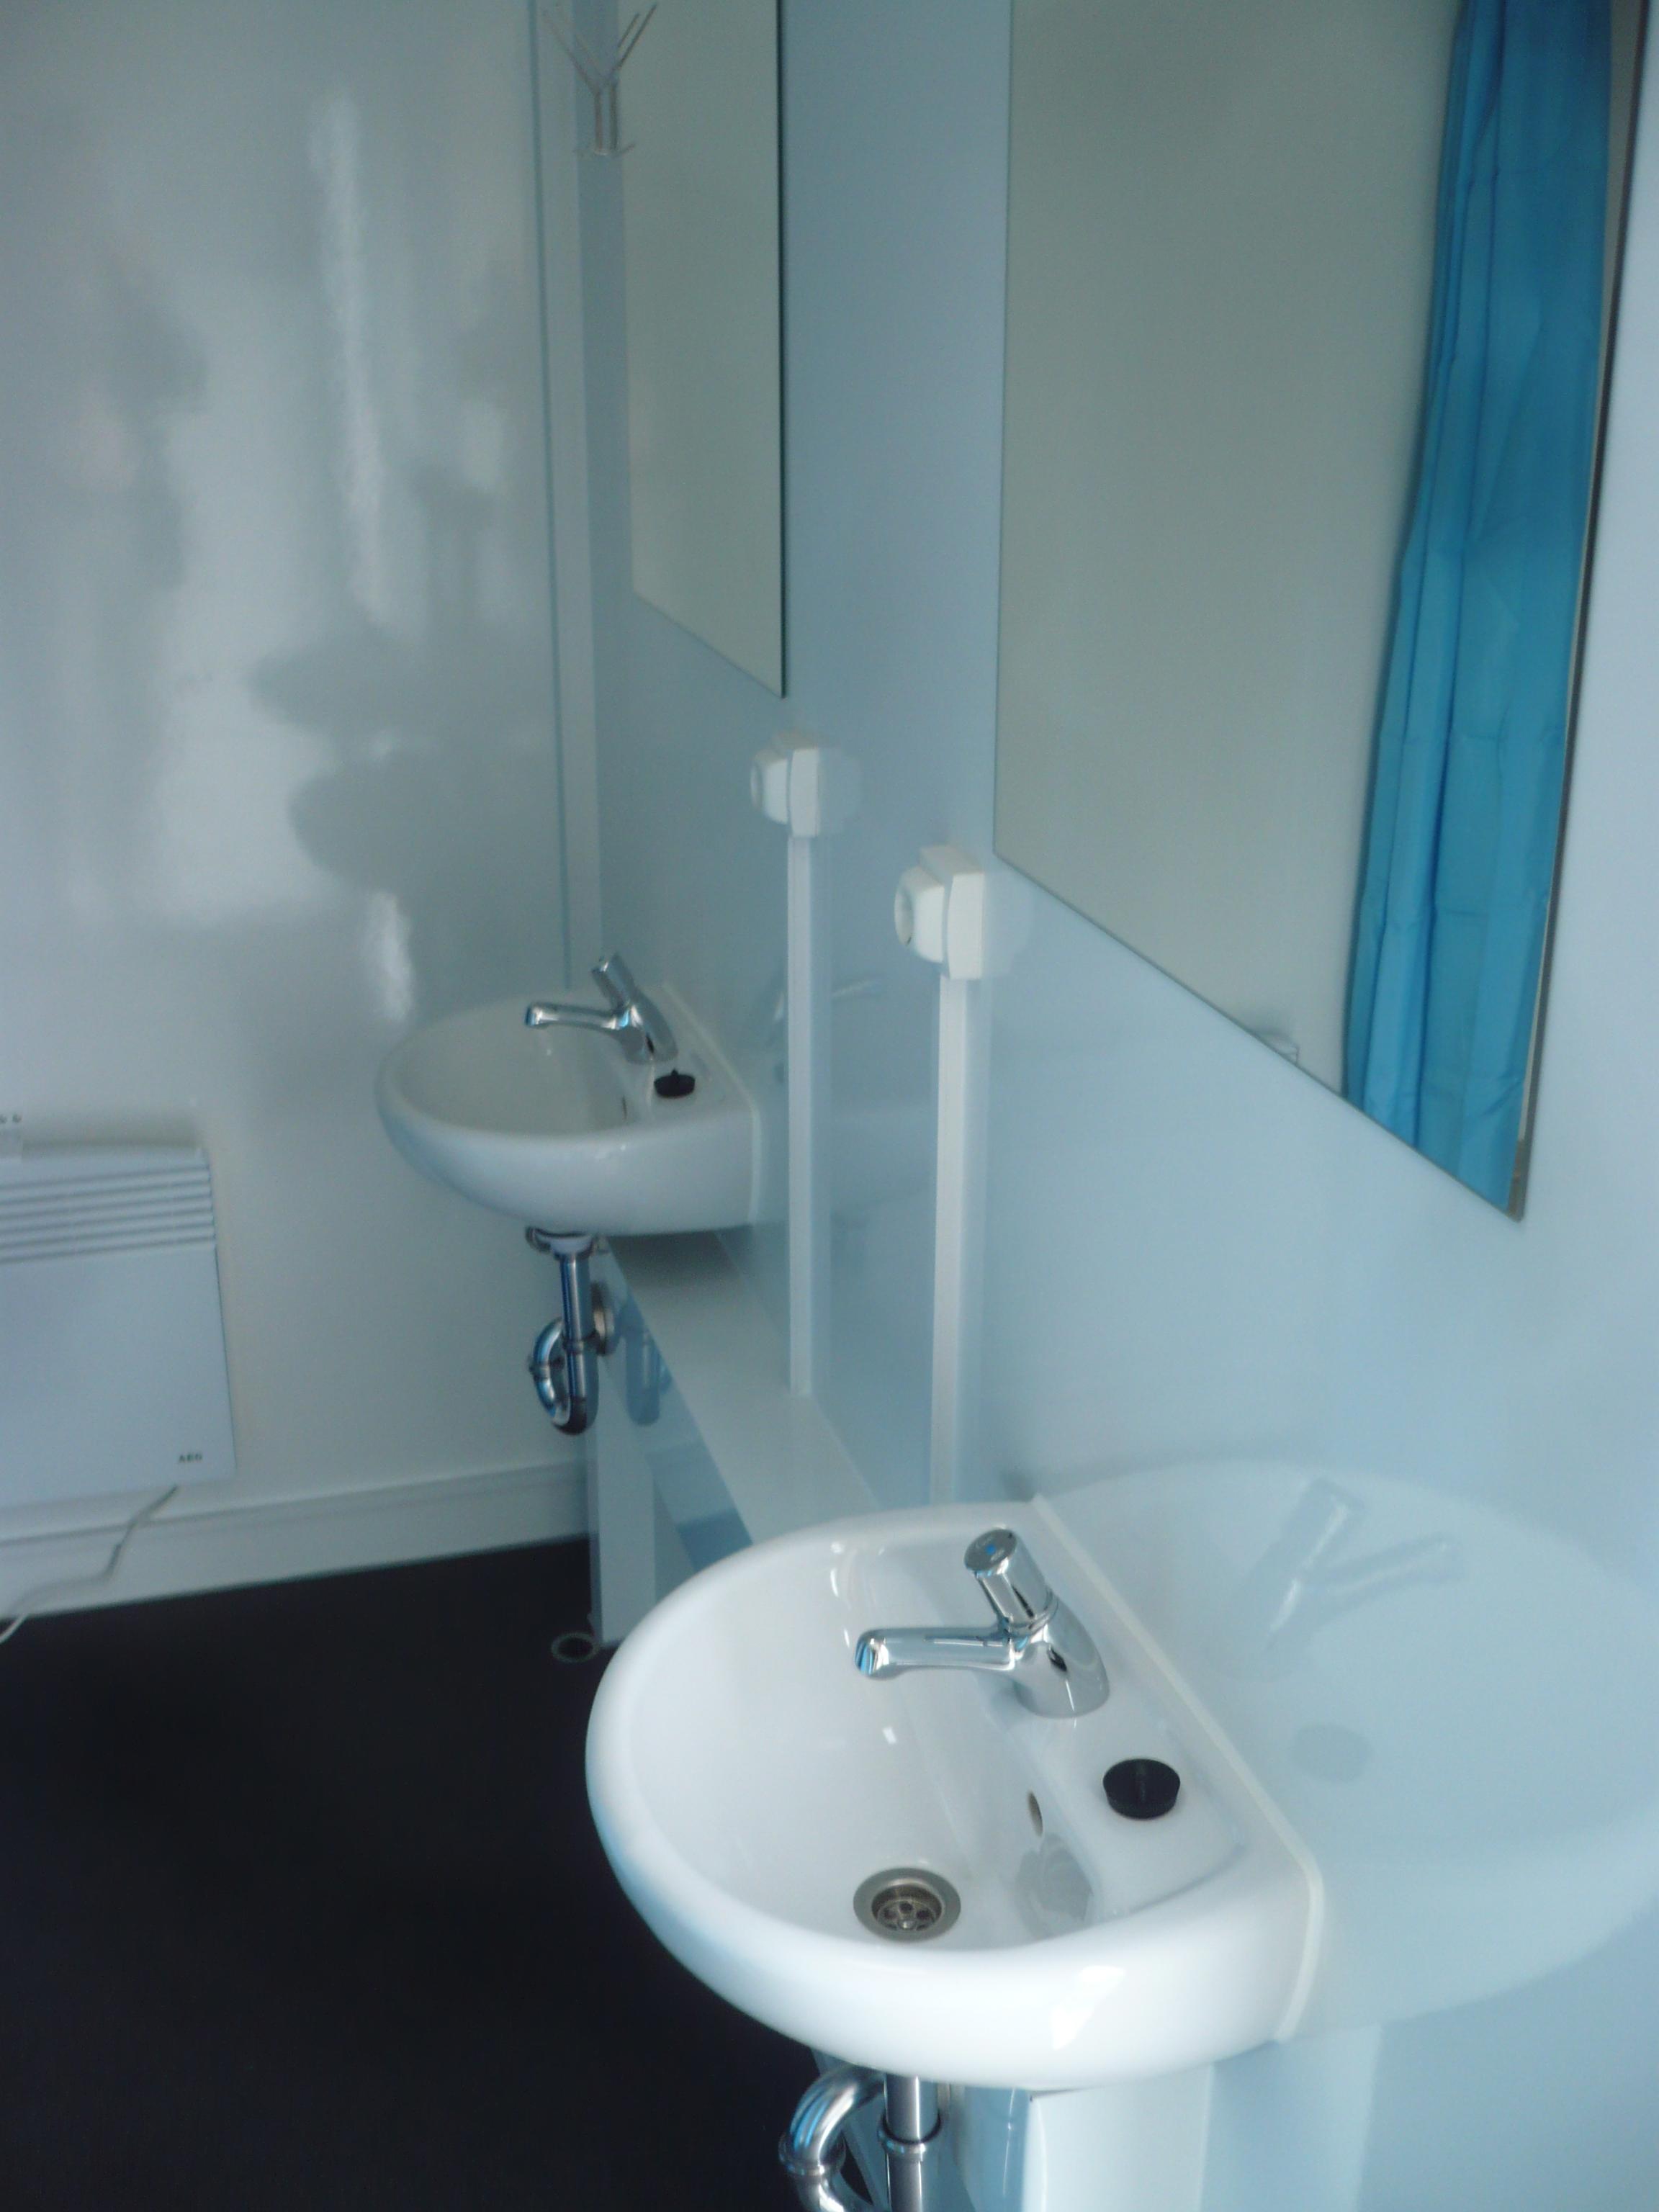 Type 8 x SHOWER - 73, Mobile showers - Eurowagon